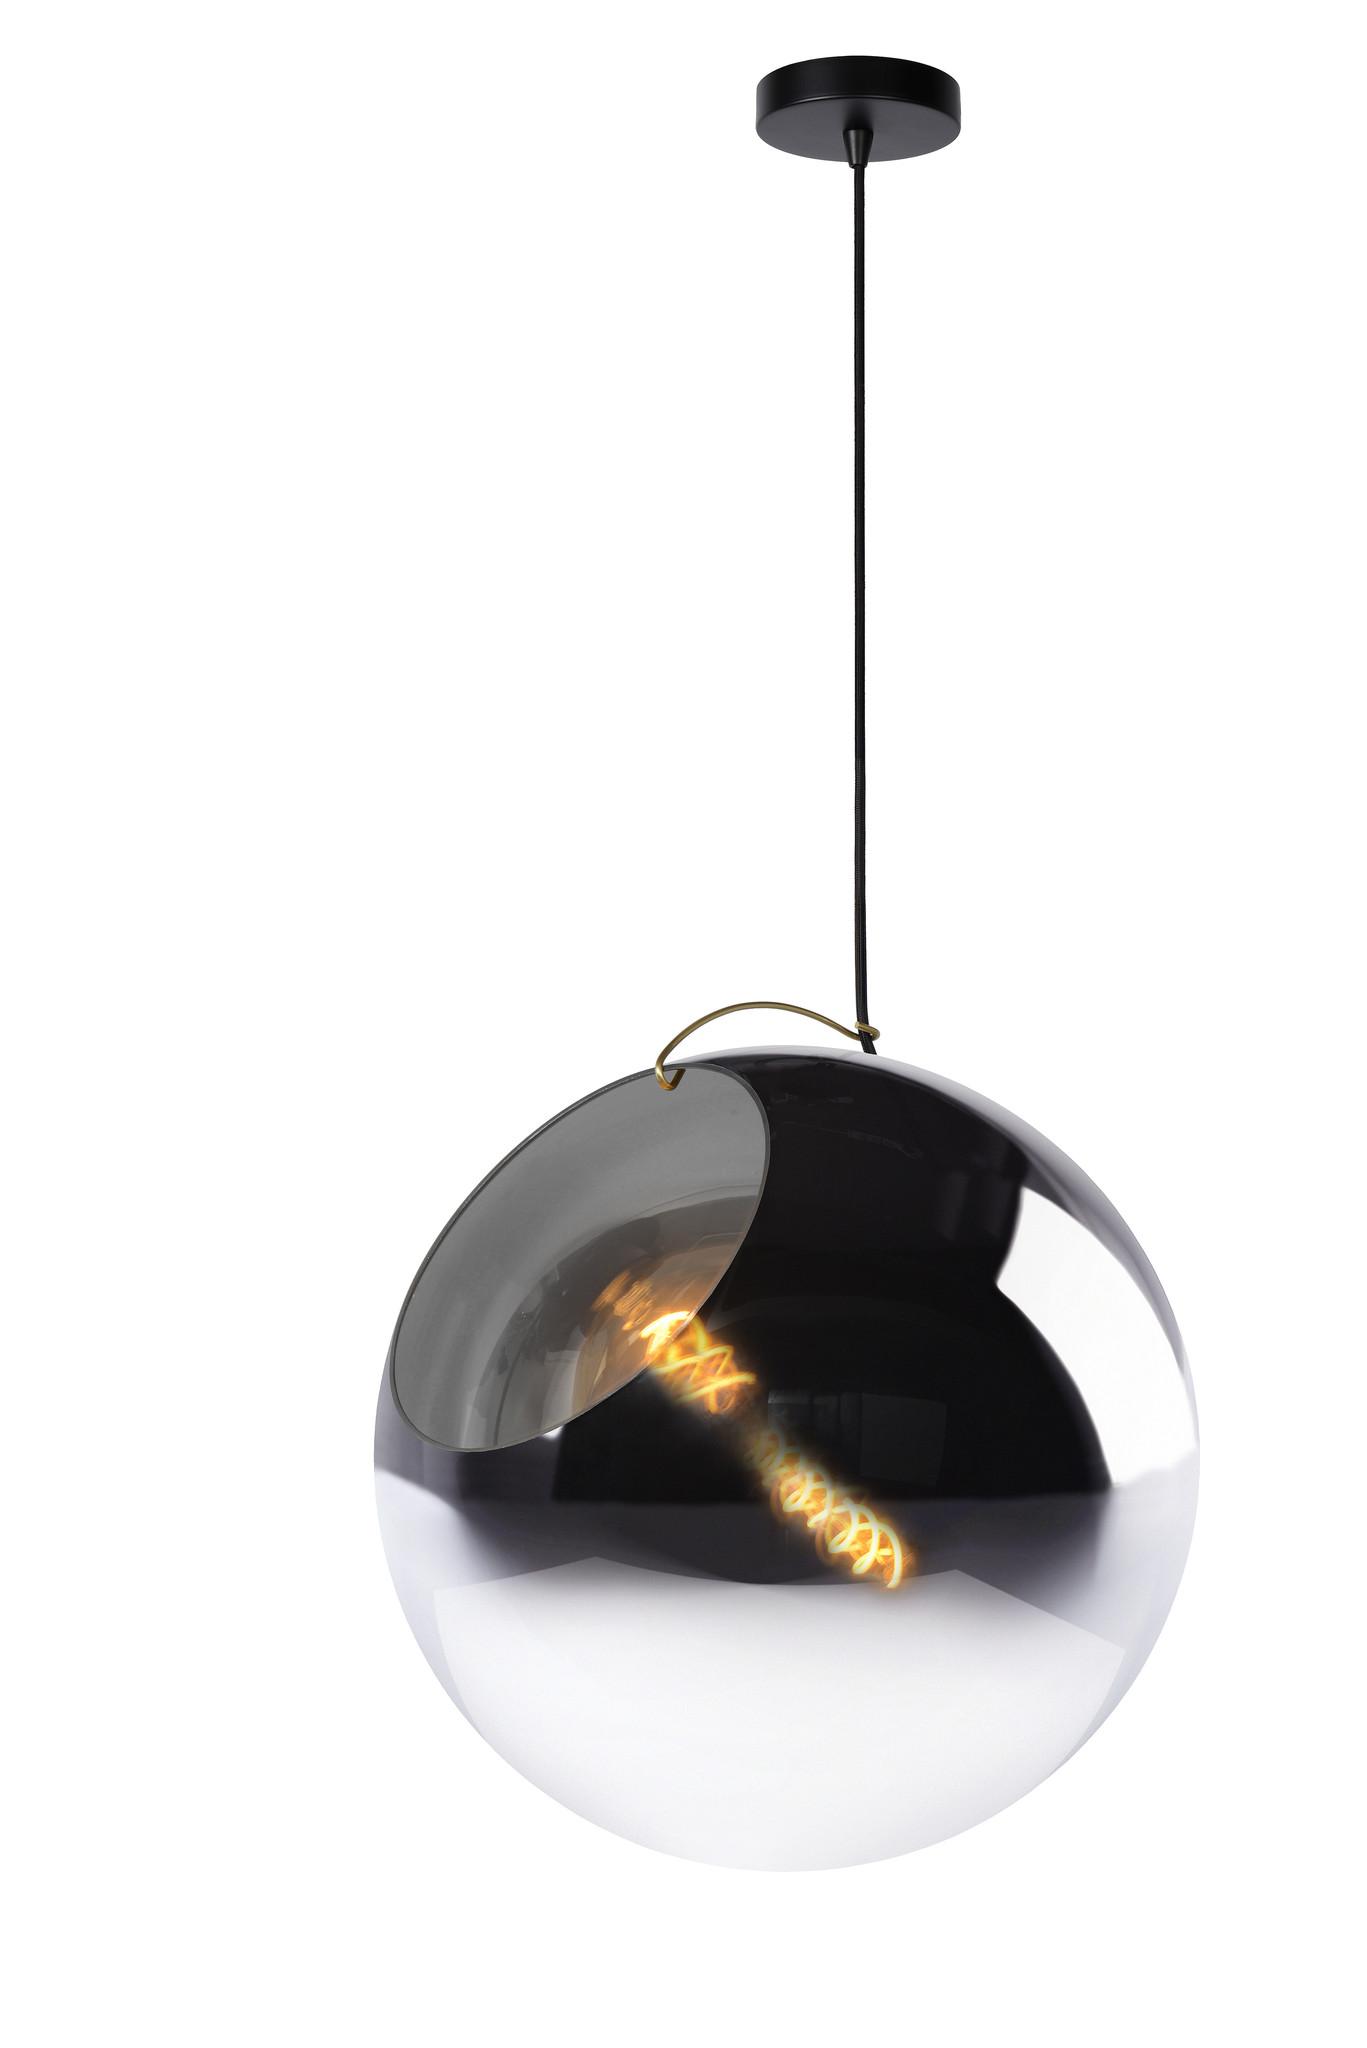 Lucide JAZZLYNN Hanglamp-Fumé-Ø40-1xE27-60W-Glas